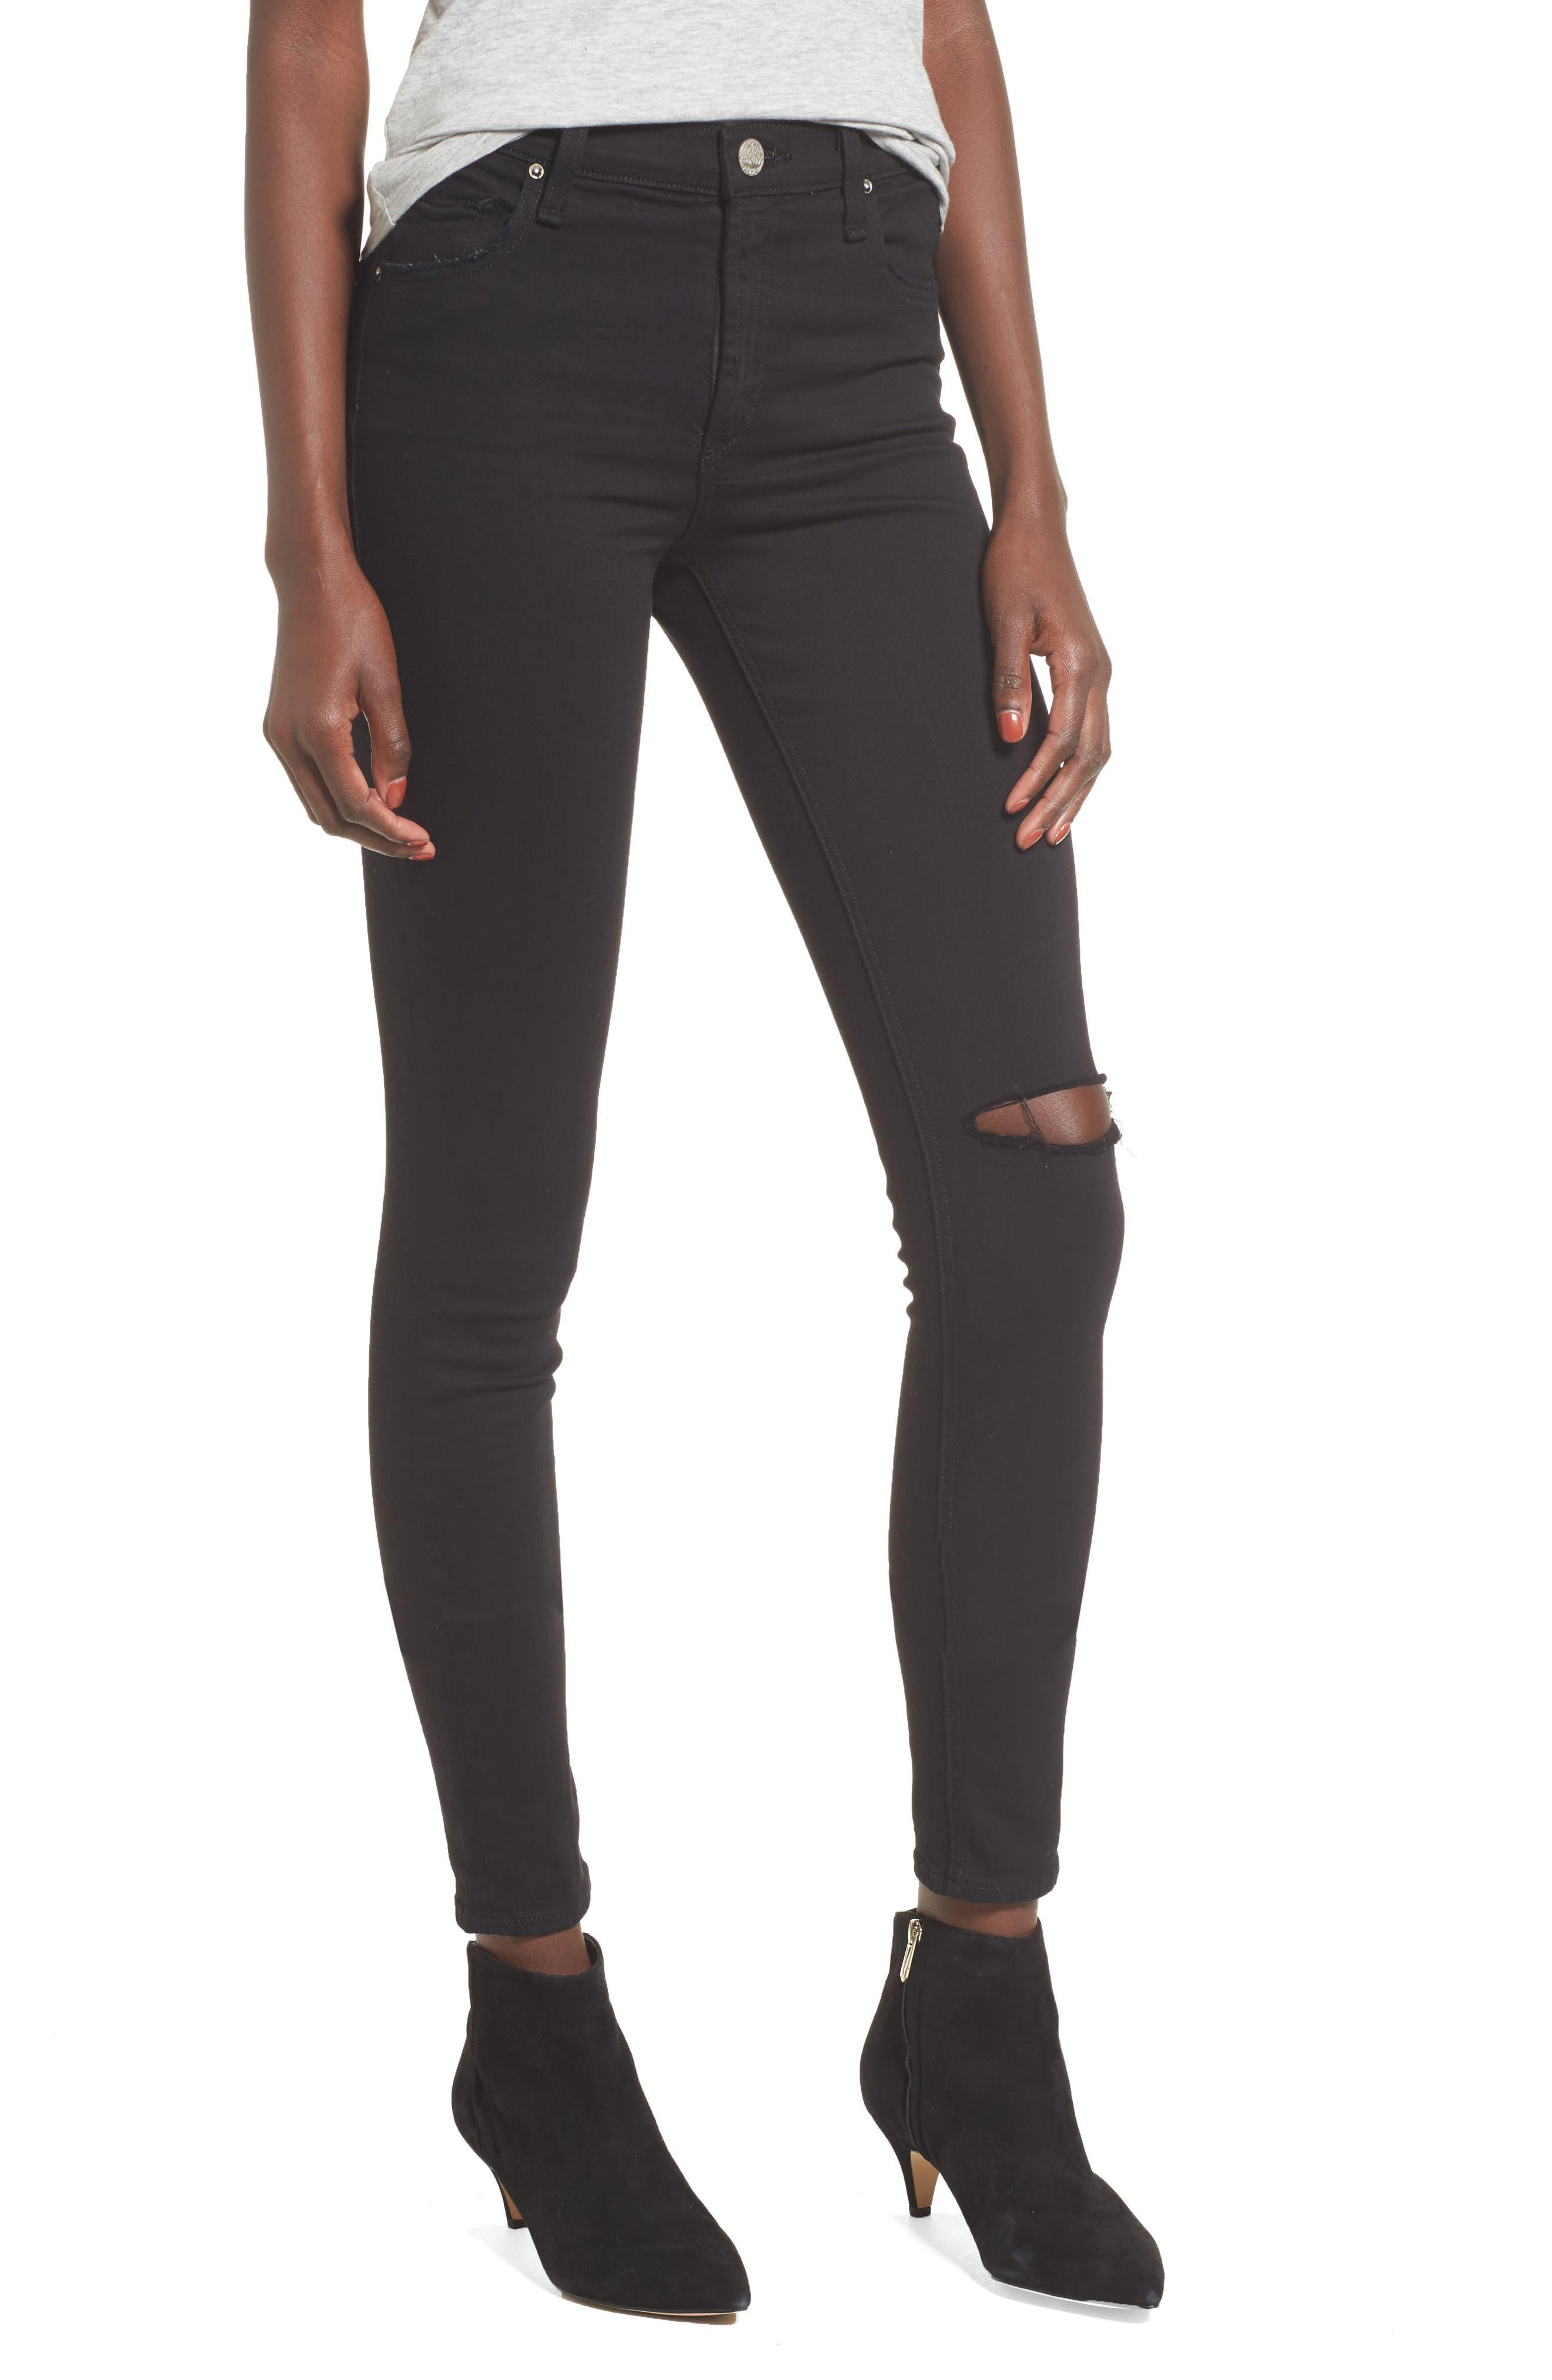 Alternate Image 1 Selected - McGuire Newton High Waist Ankle Skinny Jeans (Reposado)